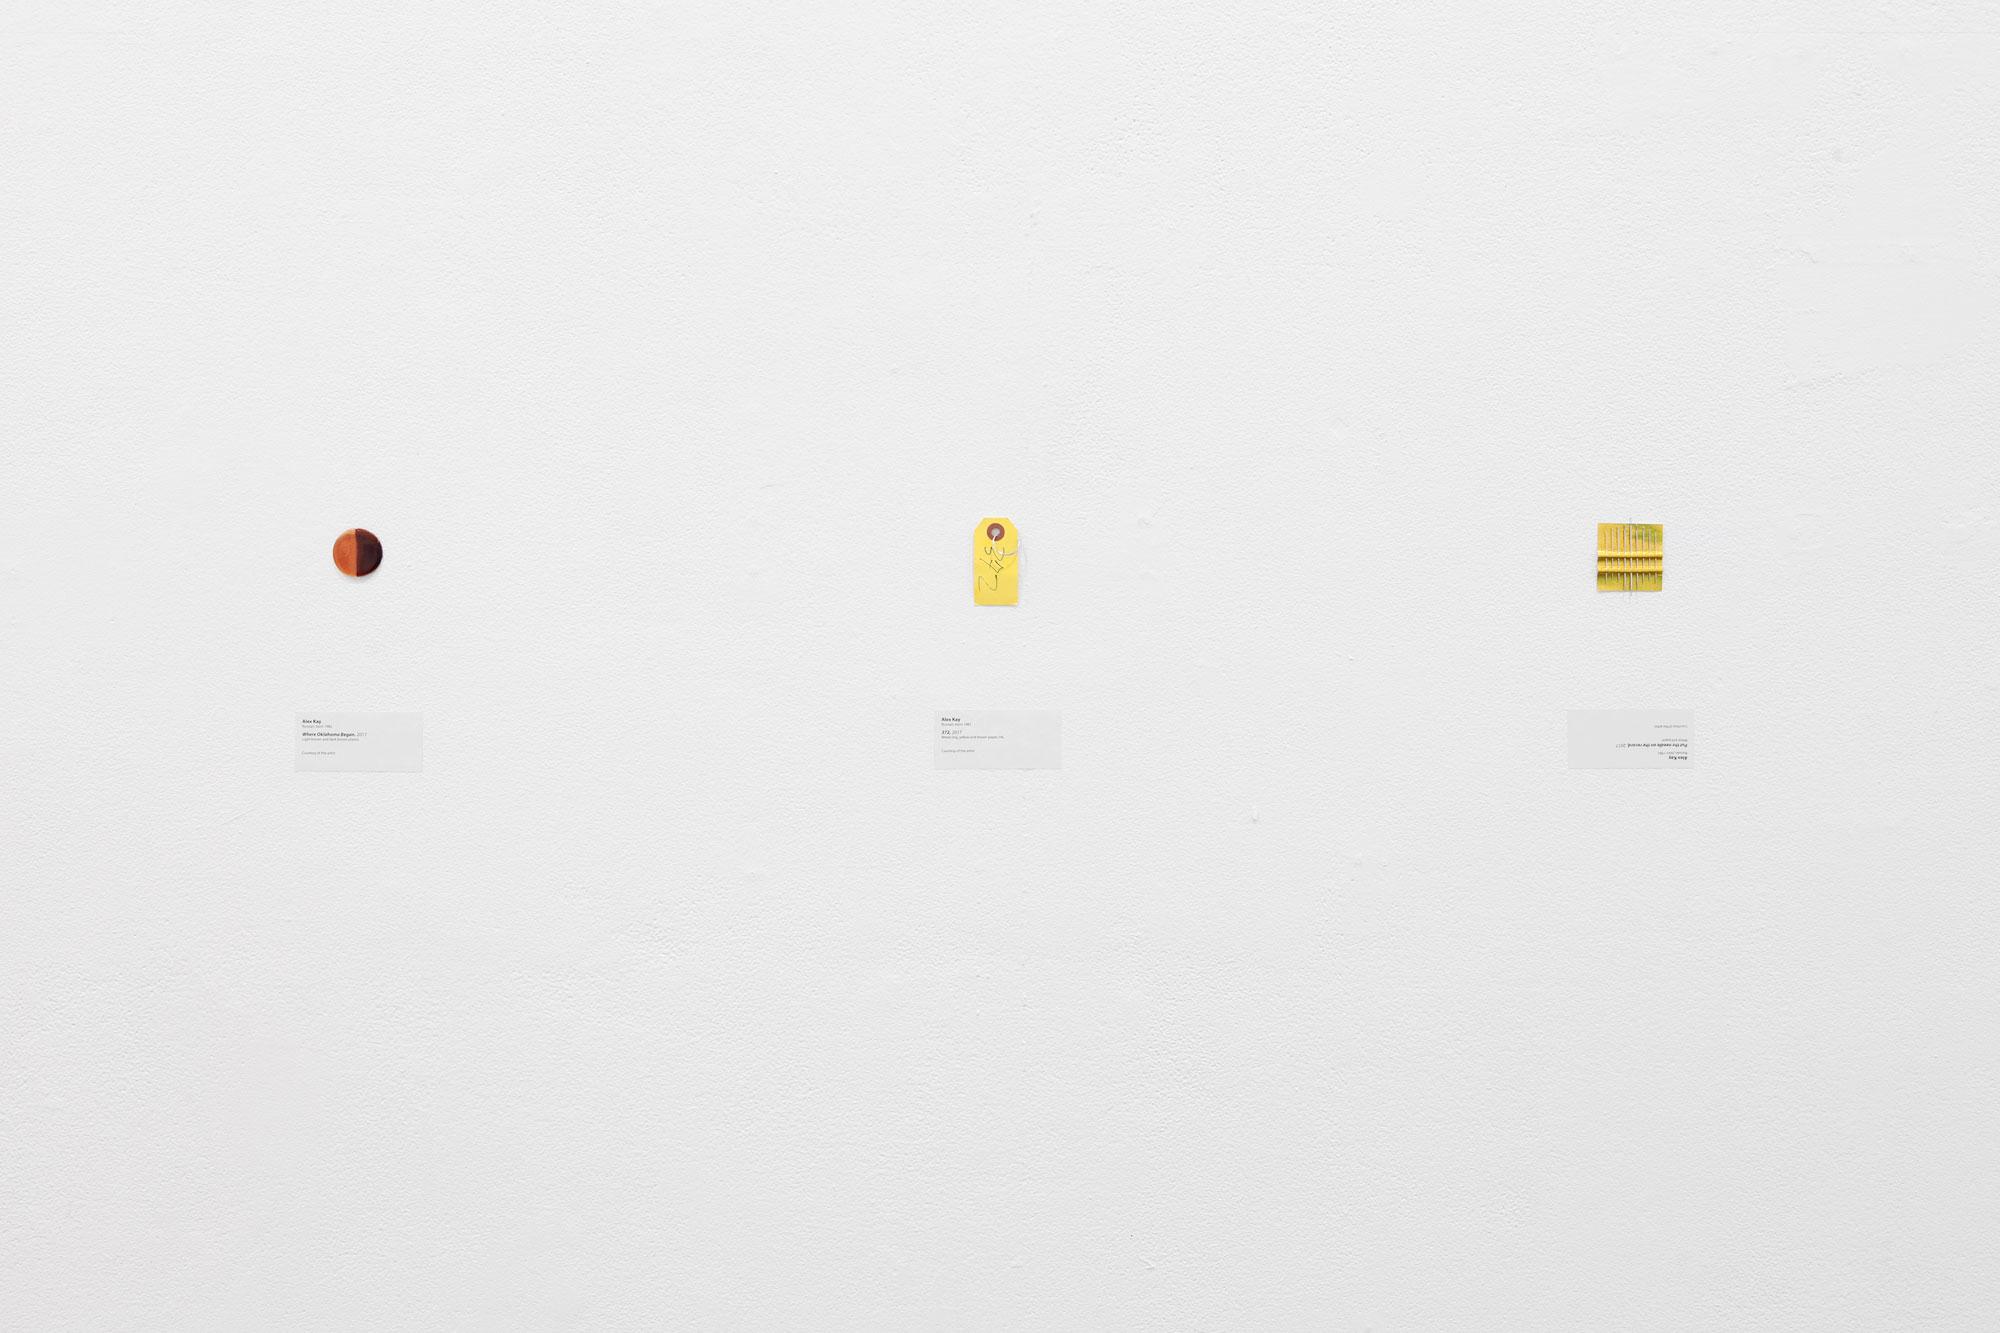 Meshki: Royal Black, Potato Sacks, i.e., Meaningmization, Small Objects #2 by Alex Kay